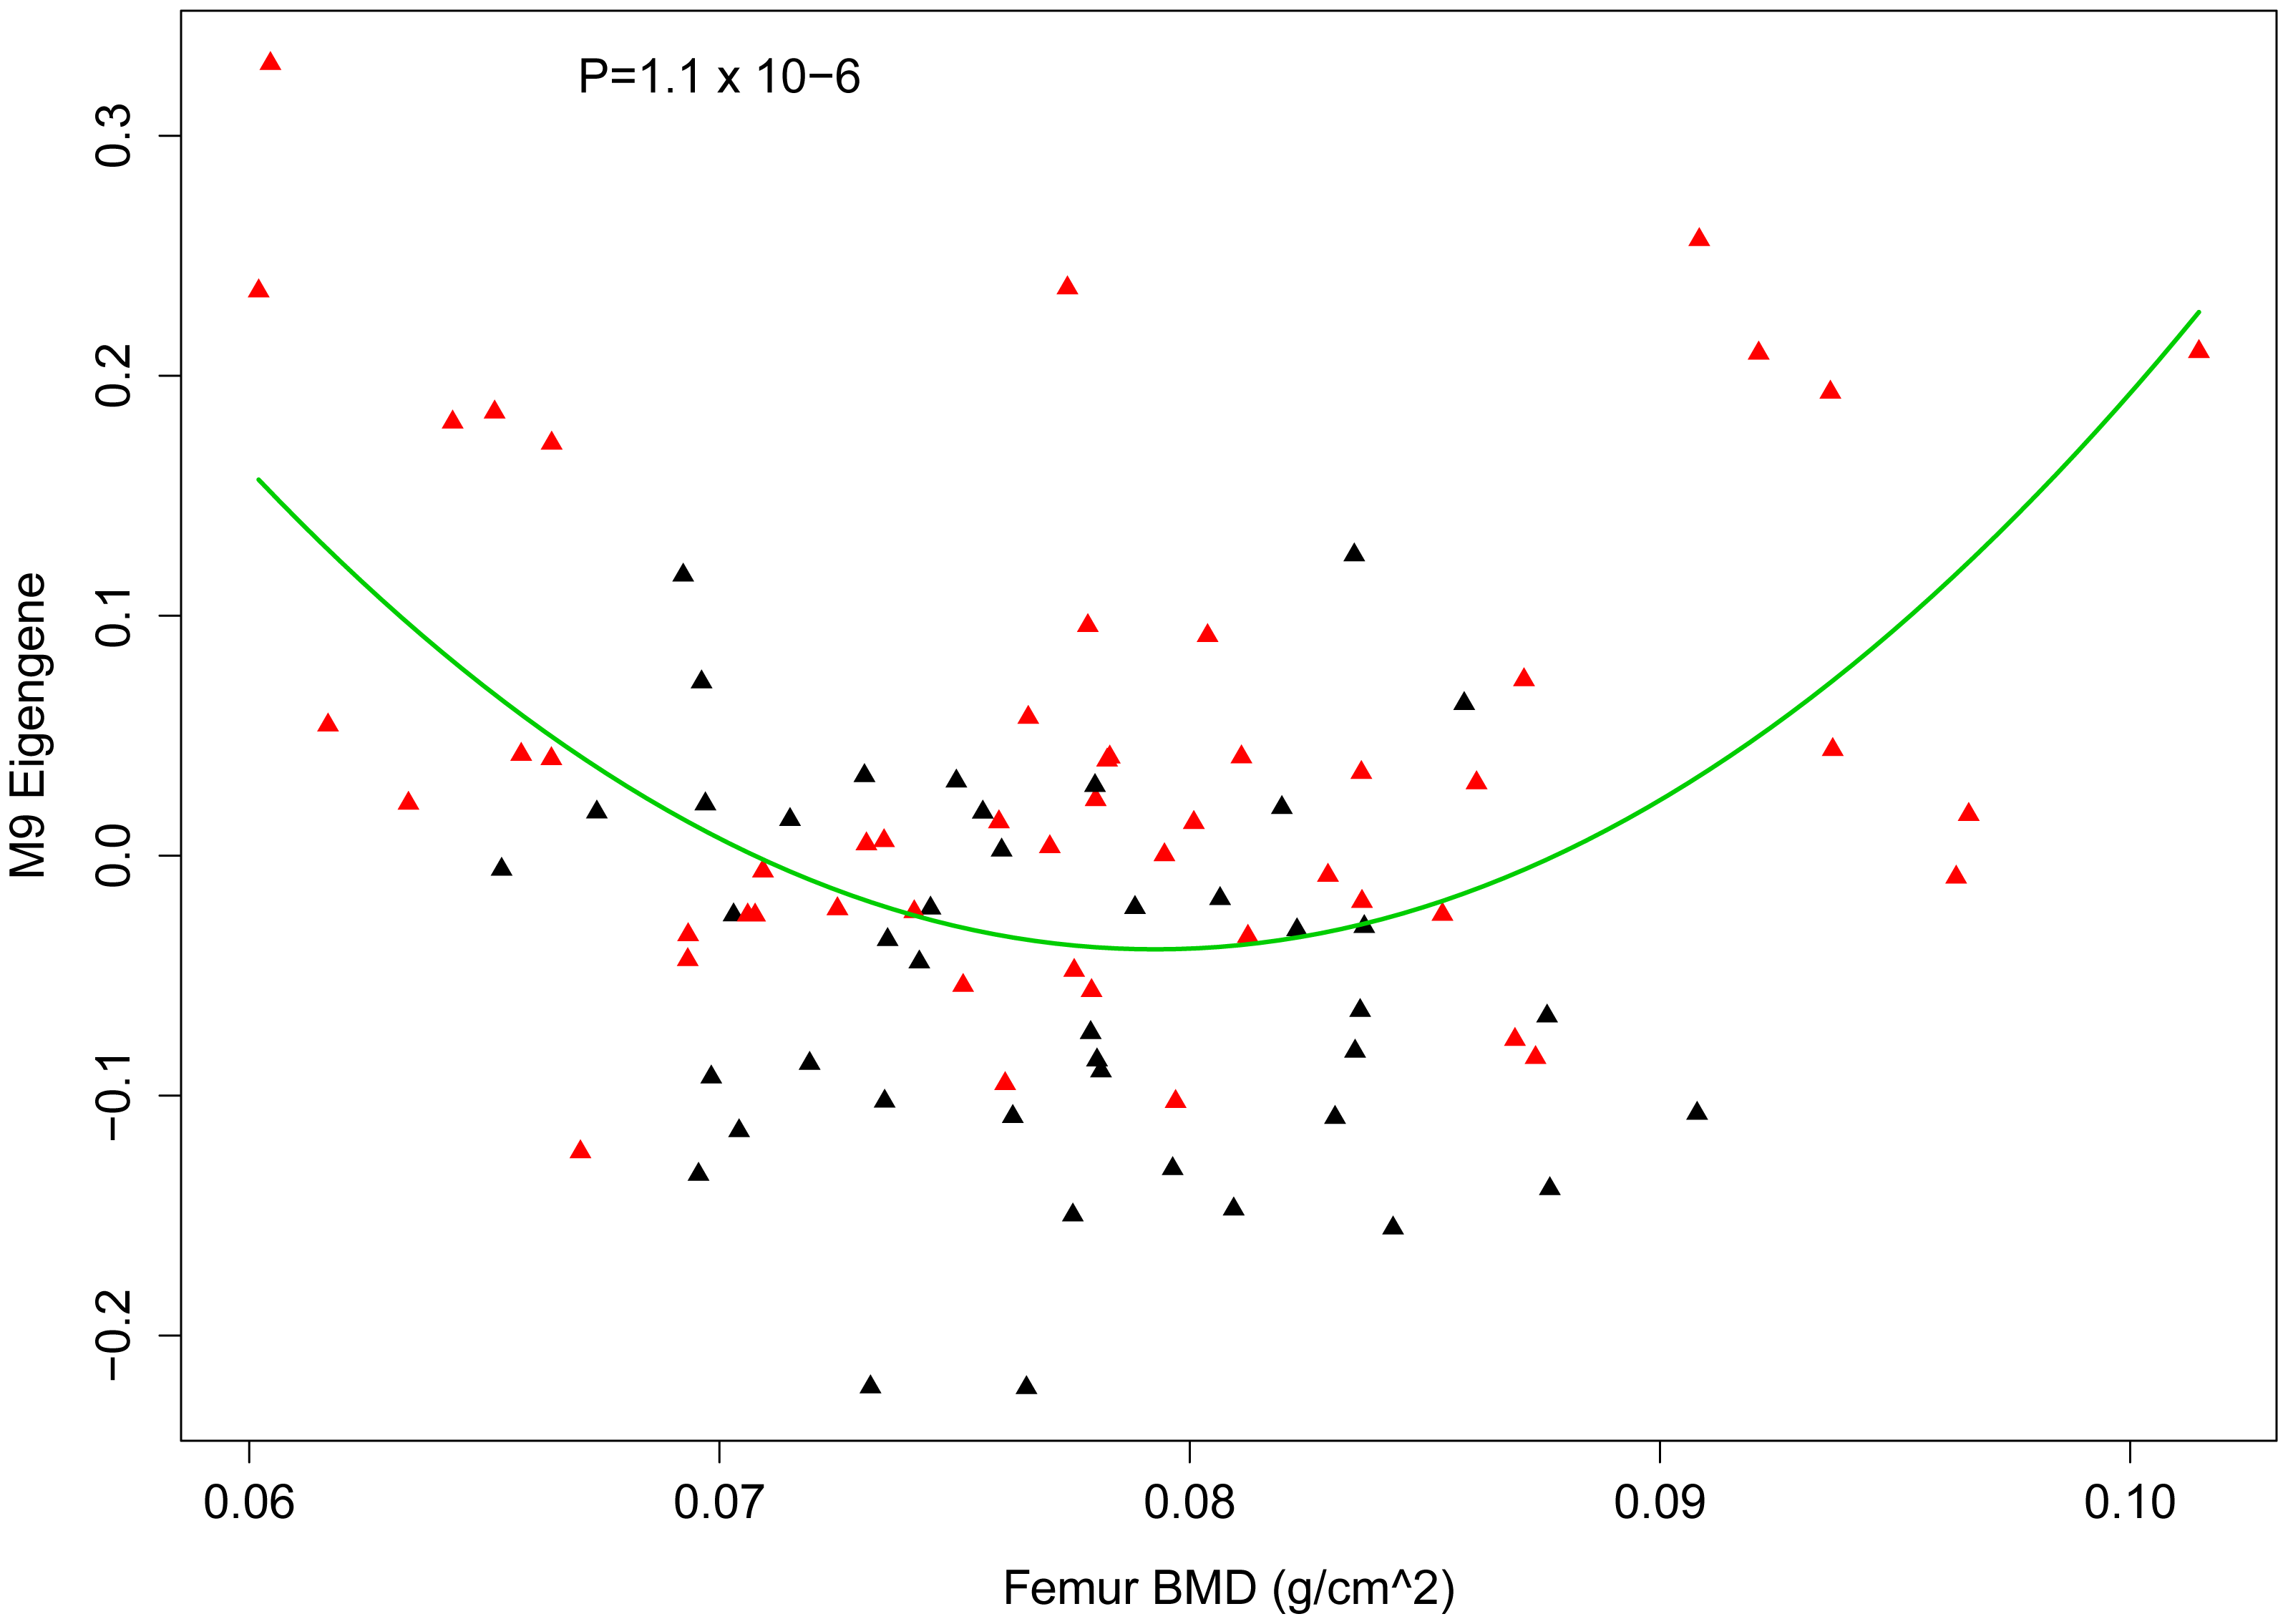 Nonlinear association between the M9 eigengene and BMD.